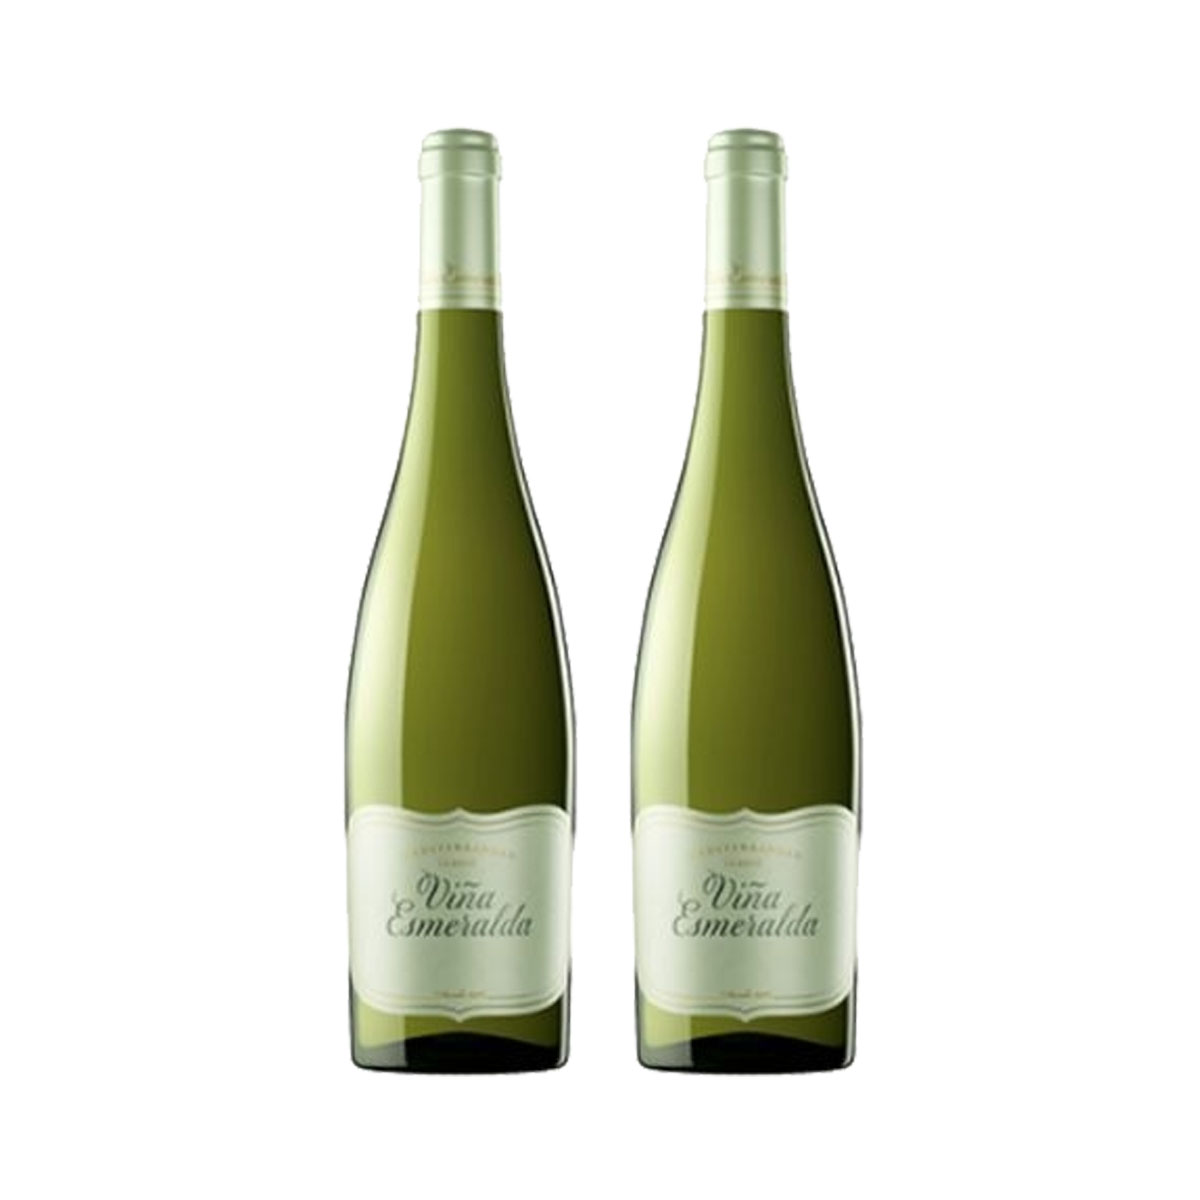 Kit 2x Vinho Branco Espanhol Torres Esmeralda 750ml 2019